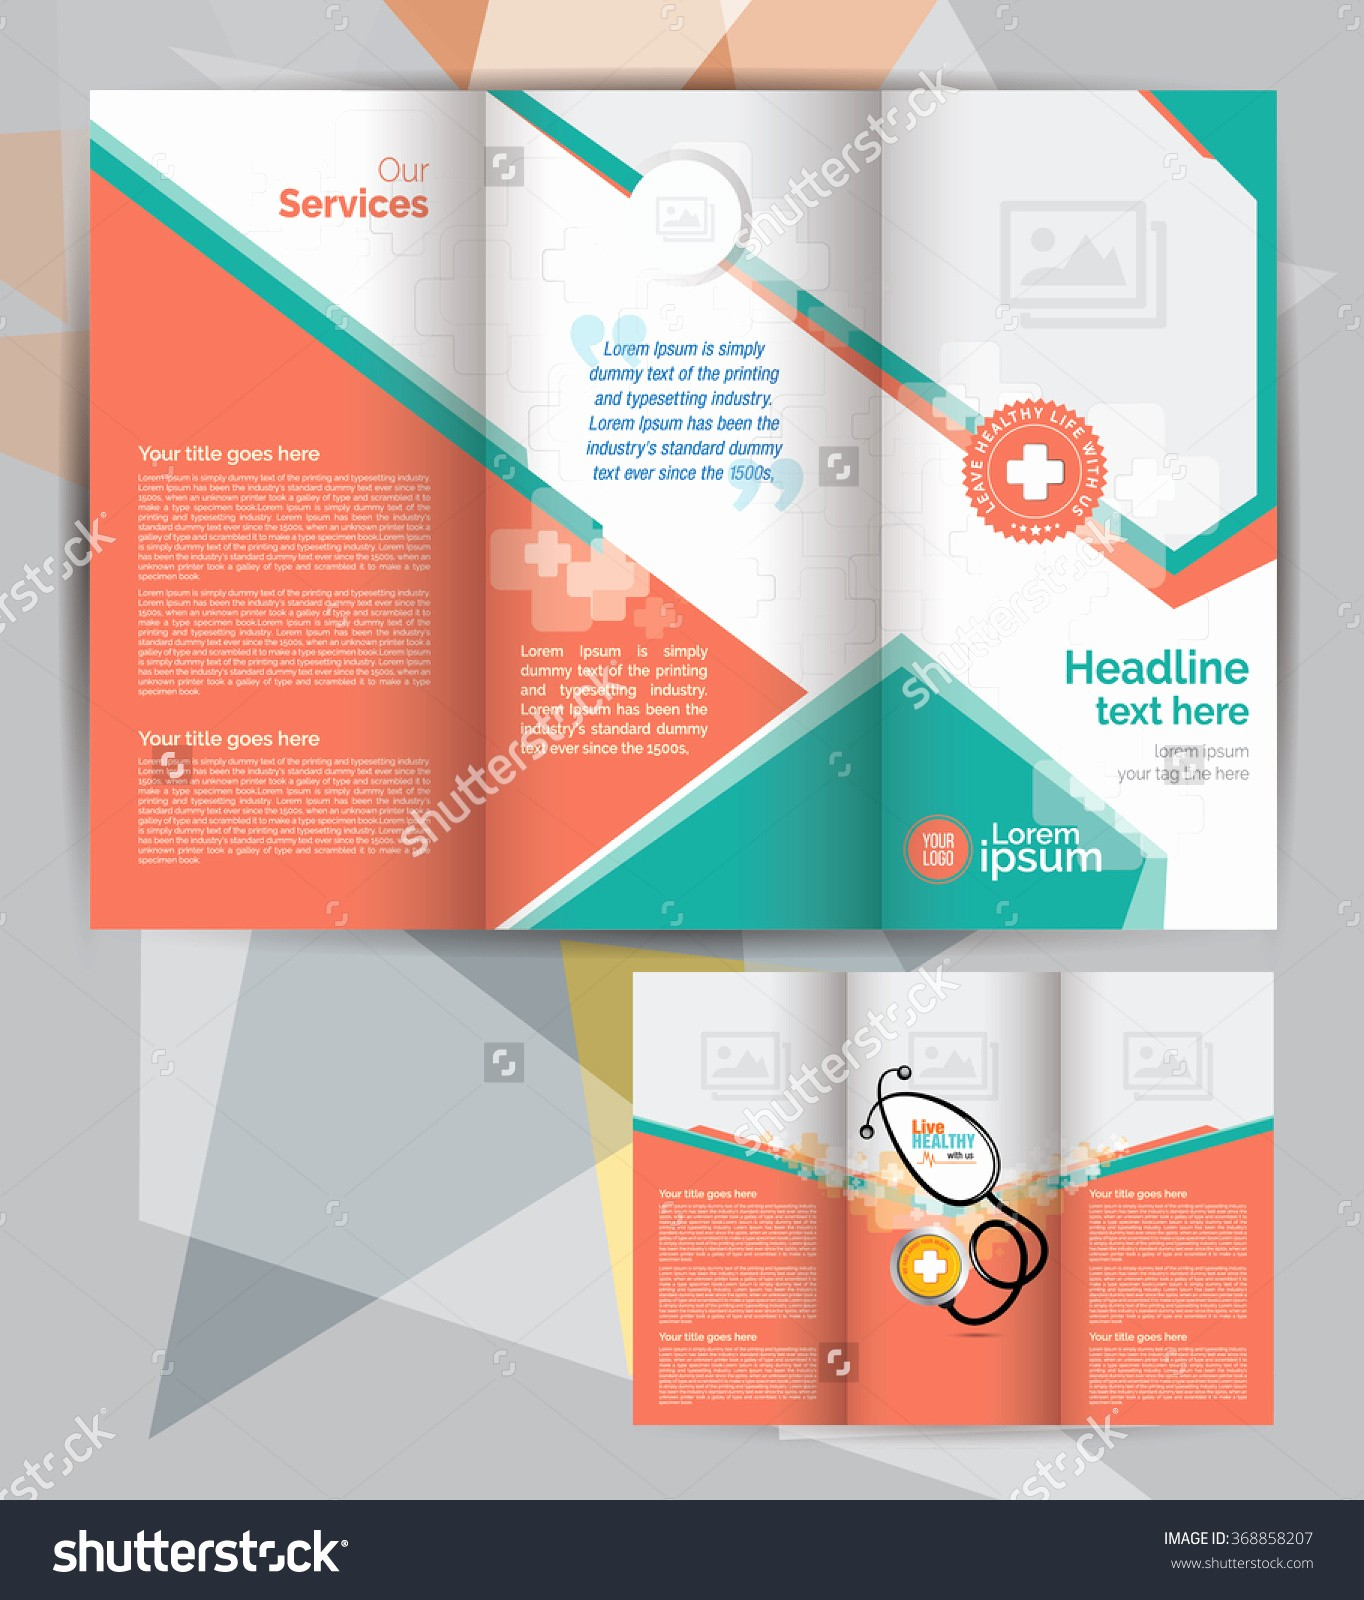 Tri-fold Brochure Examples Elegant Free Medical Brochure Templates Portablegasgrillweber